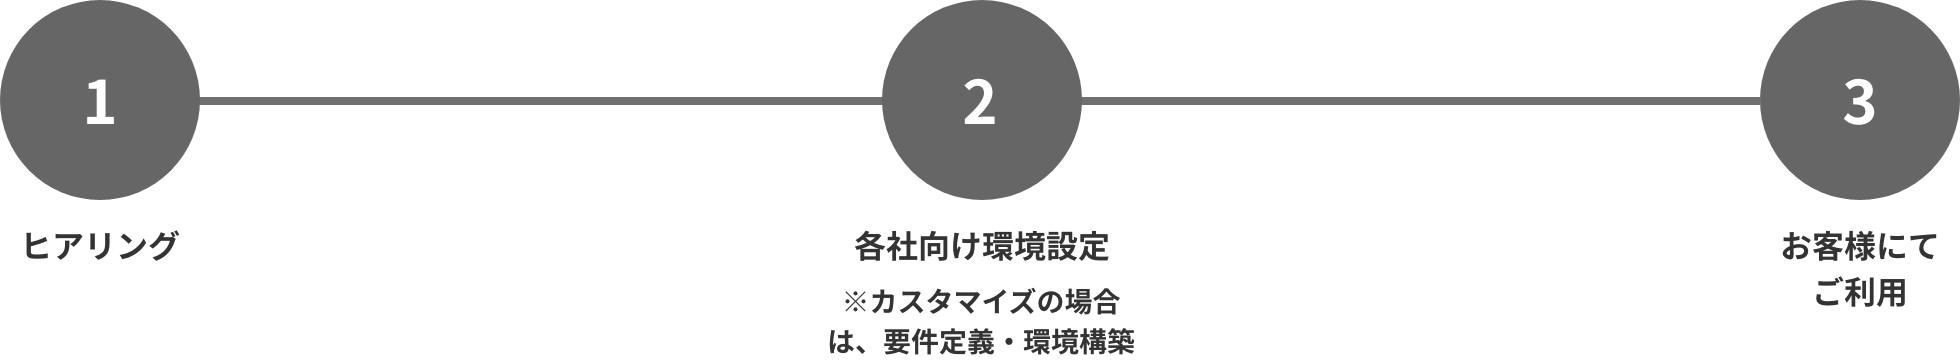 service_skill-visualization_step001